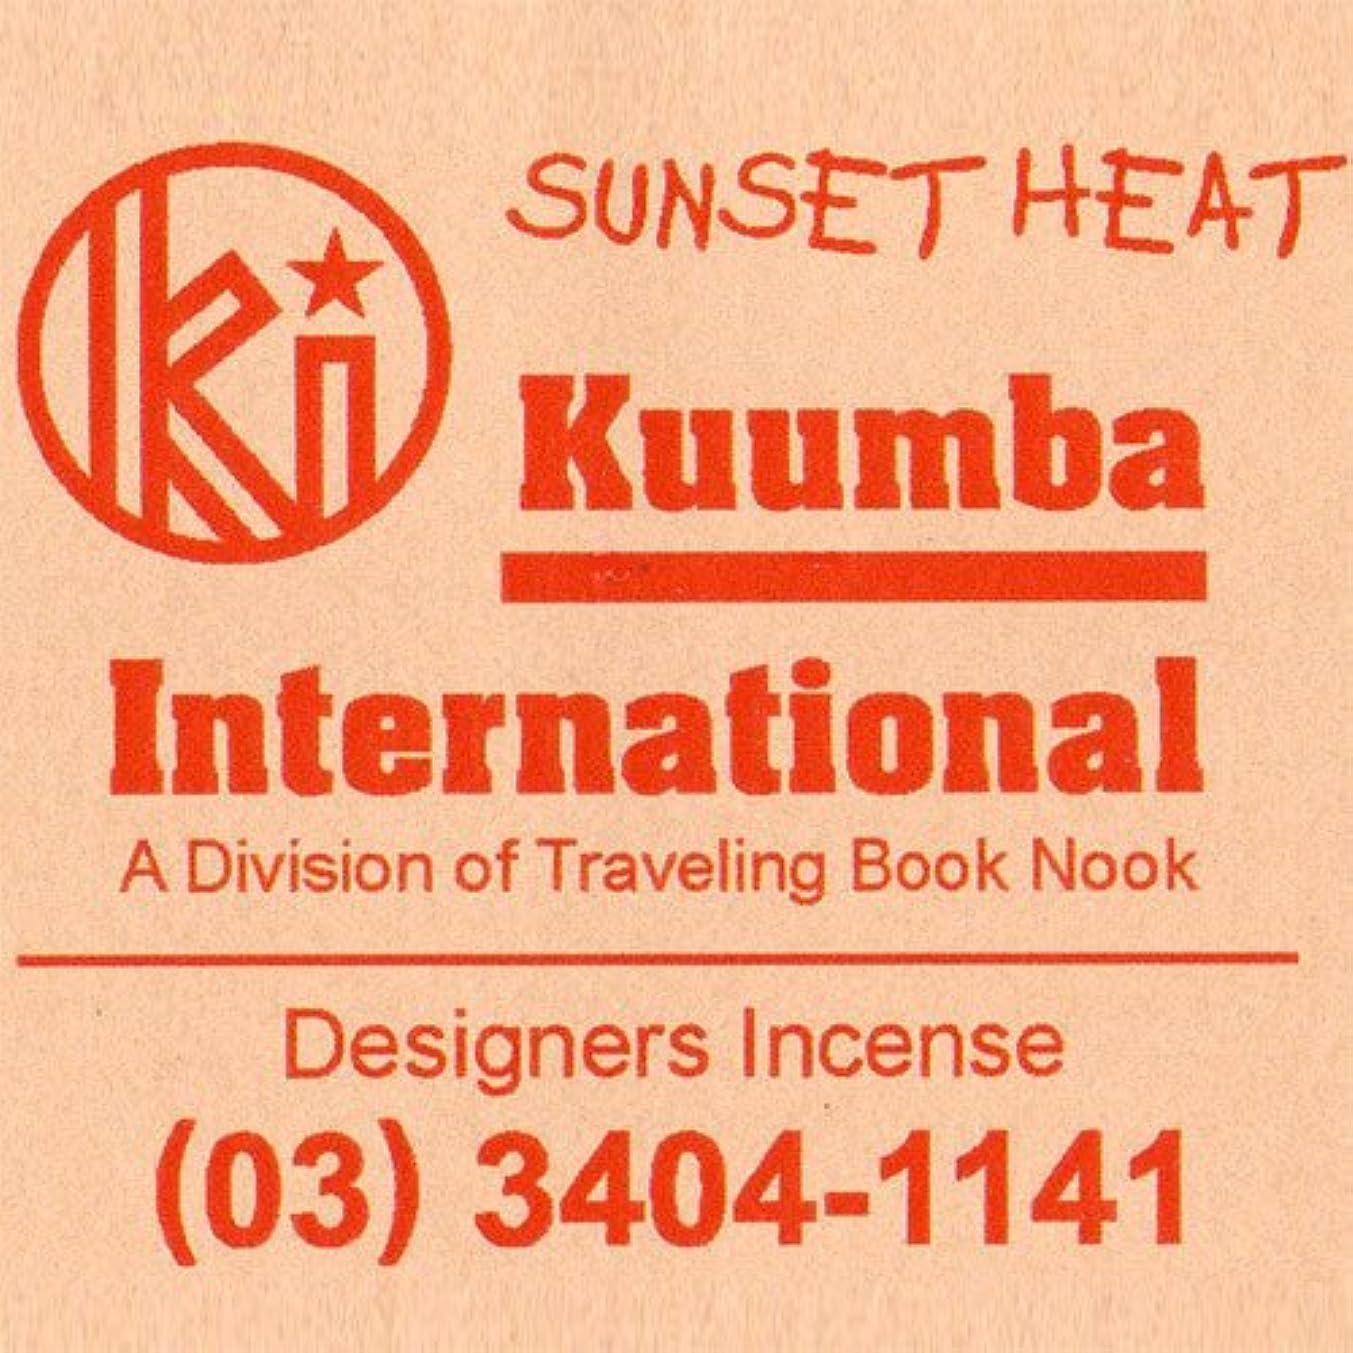 不足相対性理論配管工KUUMBA / クンバ『incense』(SUNSET HEAT) (Regular size)